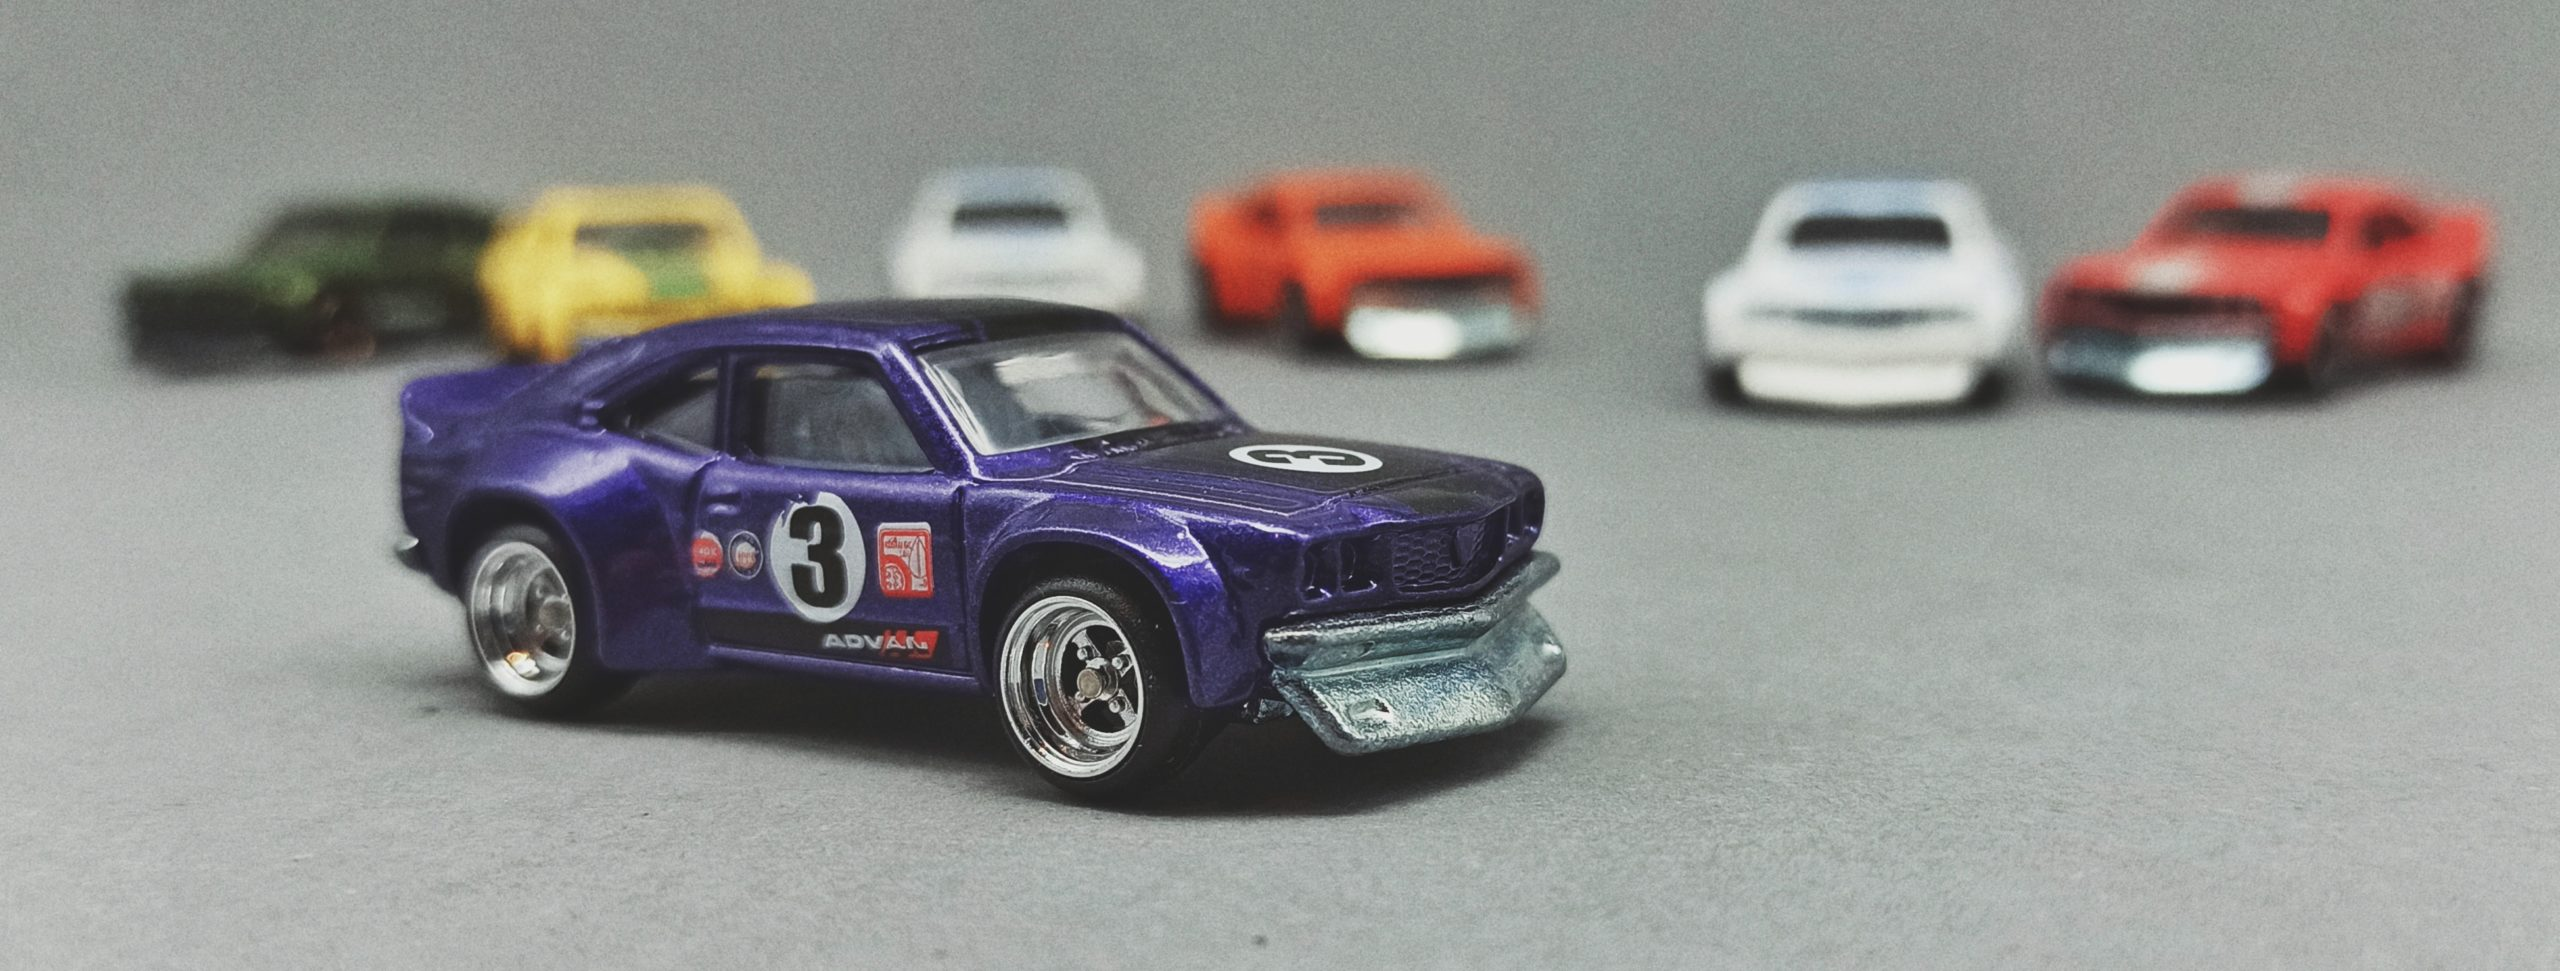 Hot Wheels Mazda RX-3 Collection 2016 Car Culture: Japan Historics (5/5), metalflake purple (DJF78)